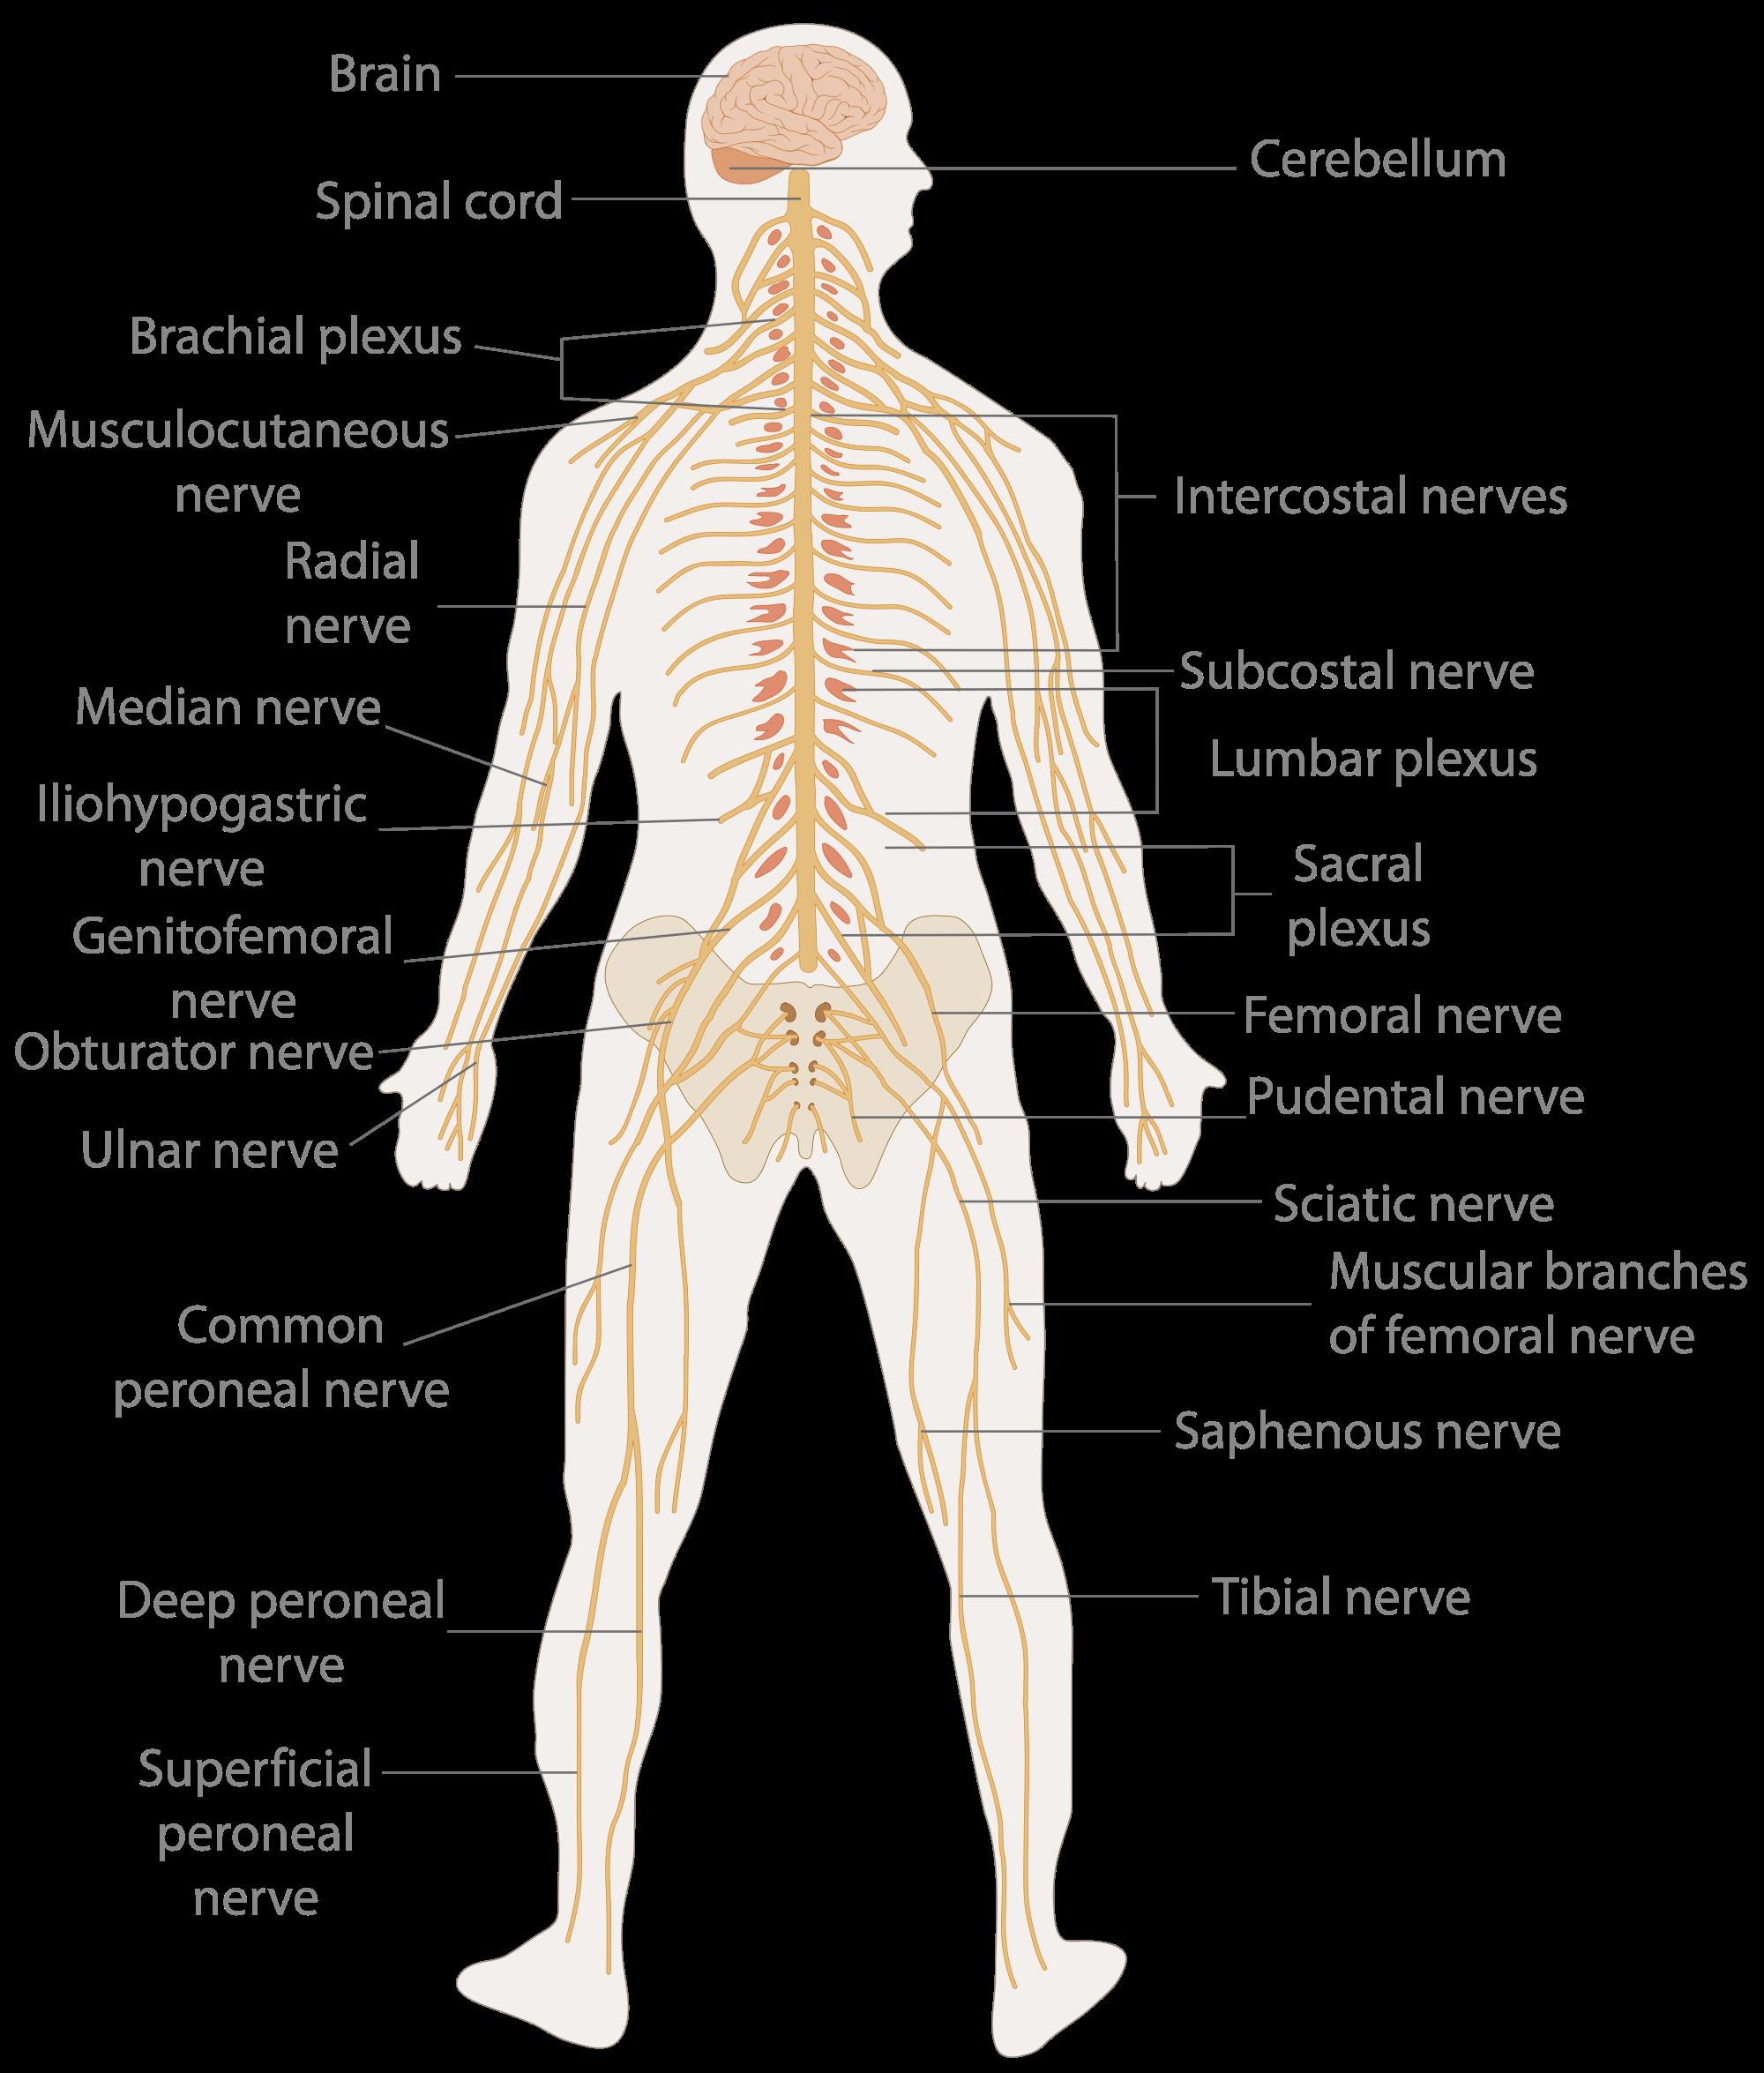 Pain Body Diagram Nerves House Wiring Diagram Symbols